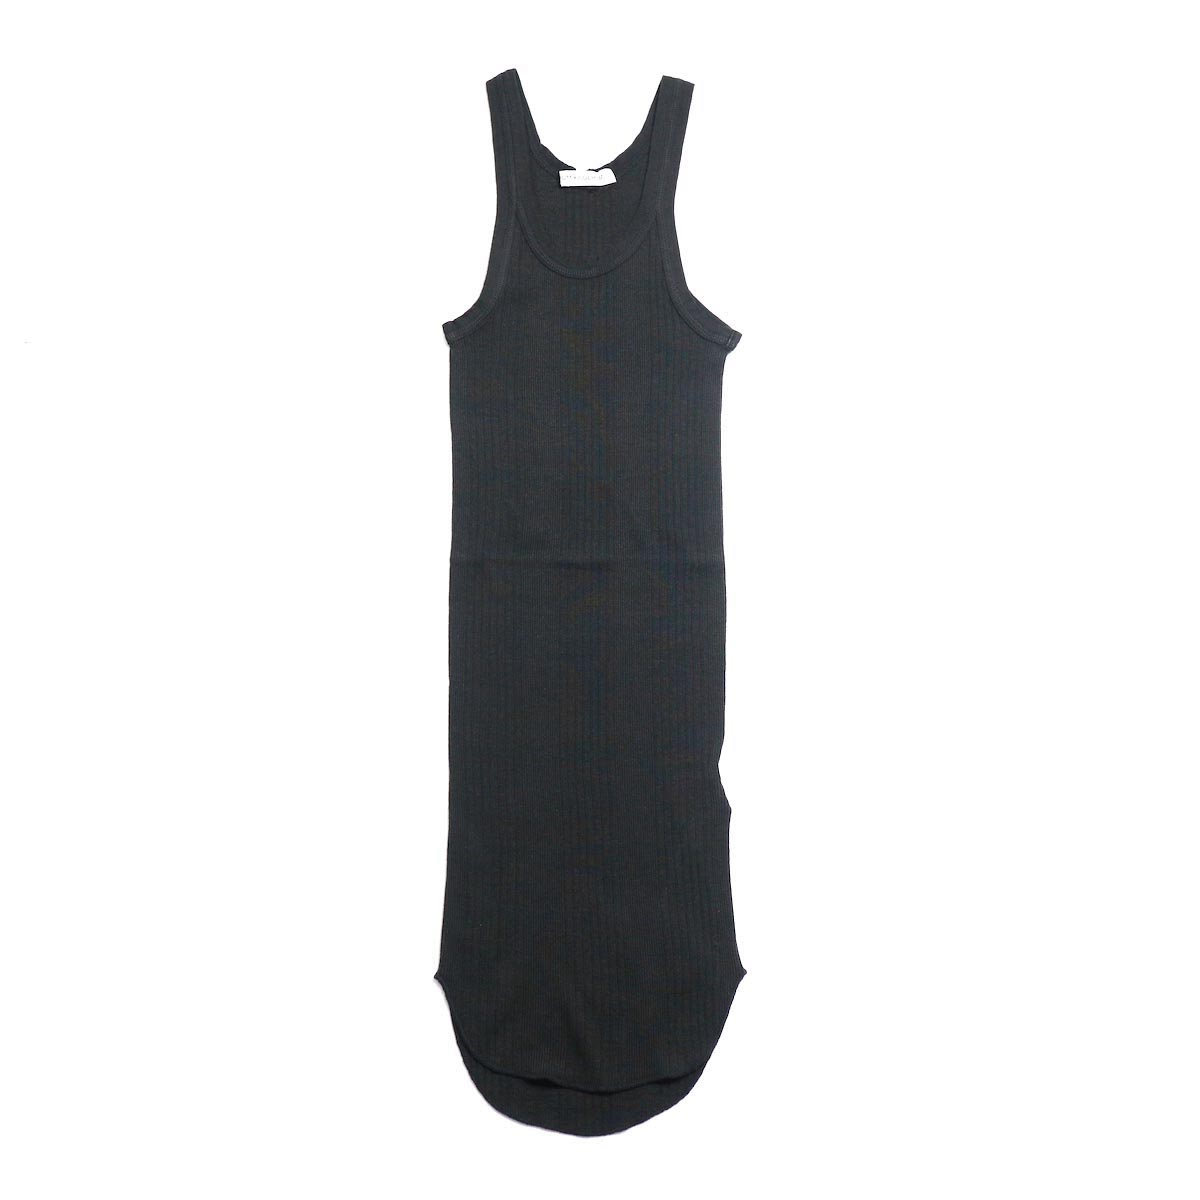 FUMIKA UCHIDA / Cotton Needle Drawing Tank Top -Black